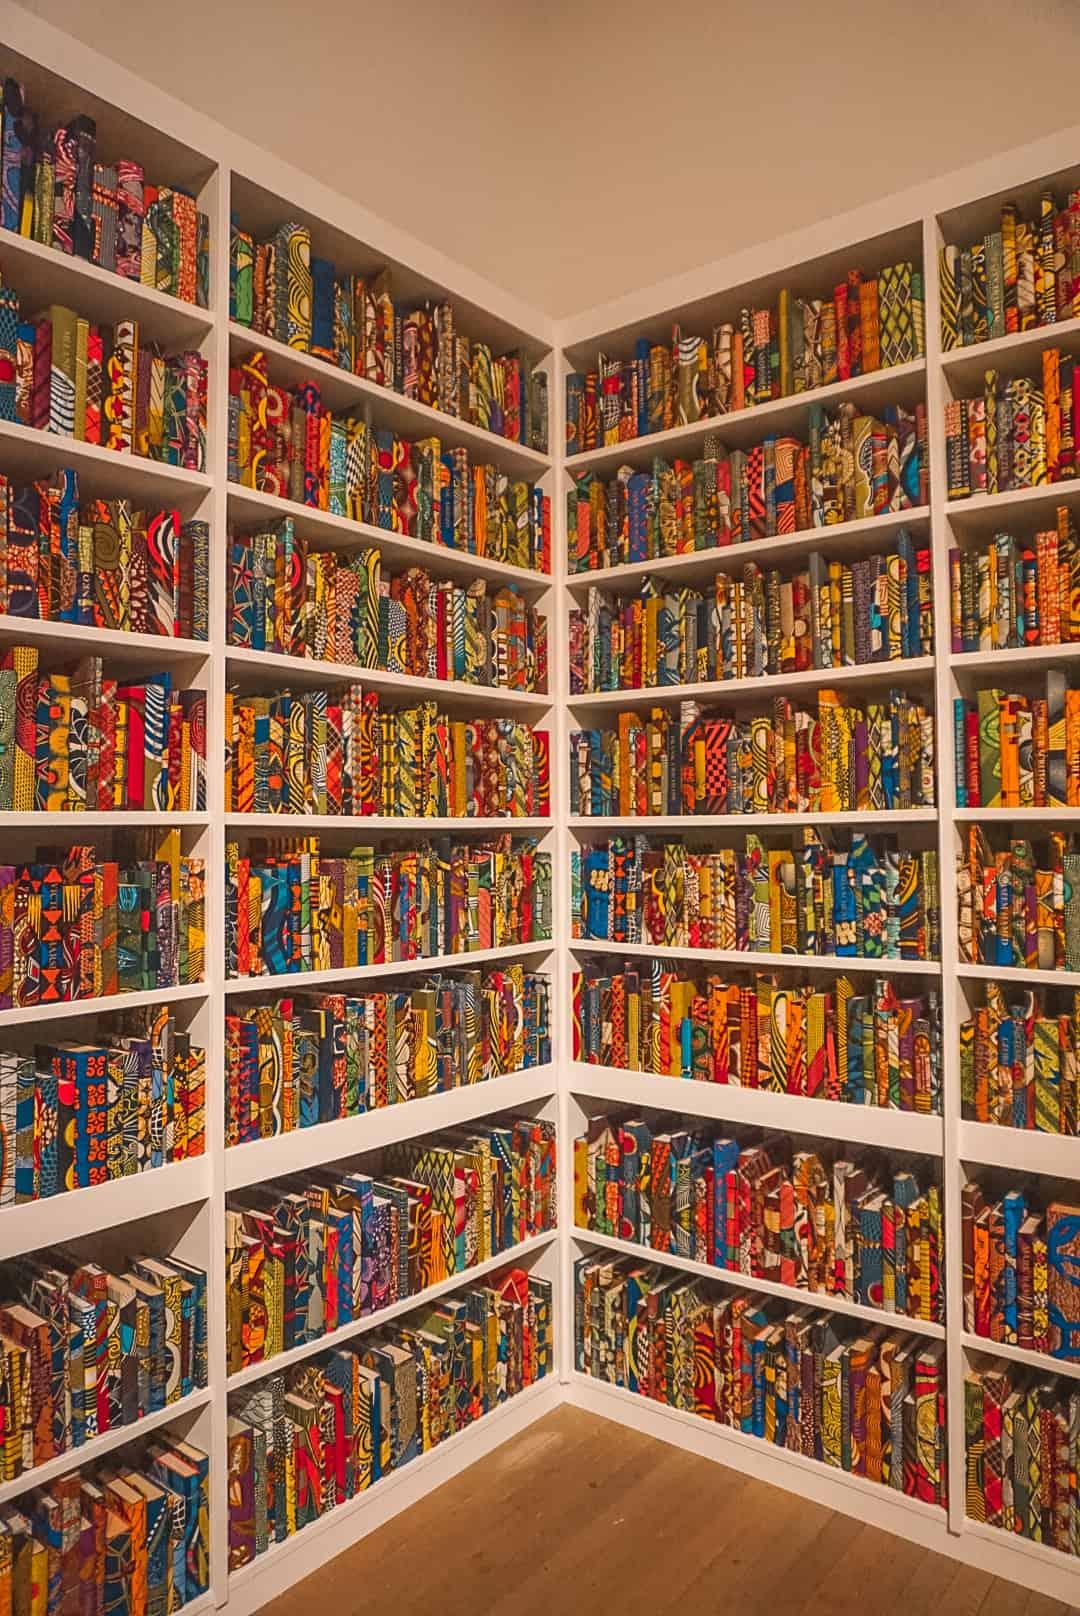 Bookcase-at-Tate-Modern